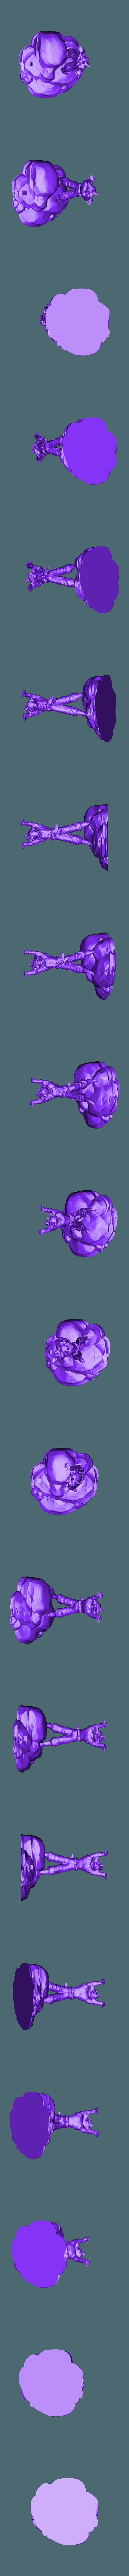 Goku_Spirit_bomb.stl Download free STL file Goku Spirit Bomb • Design to 3D print, Kiwi3D